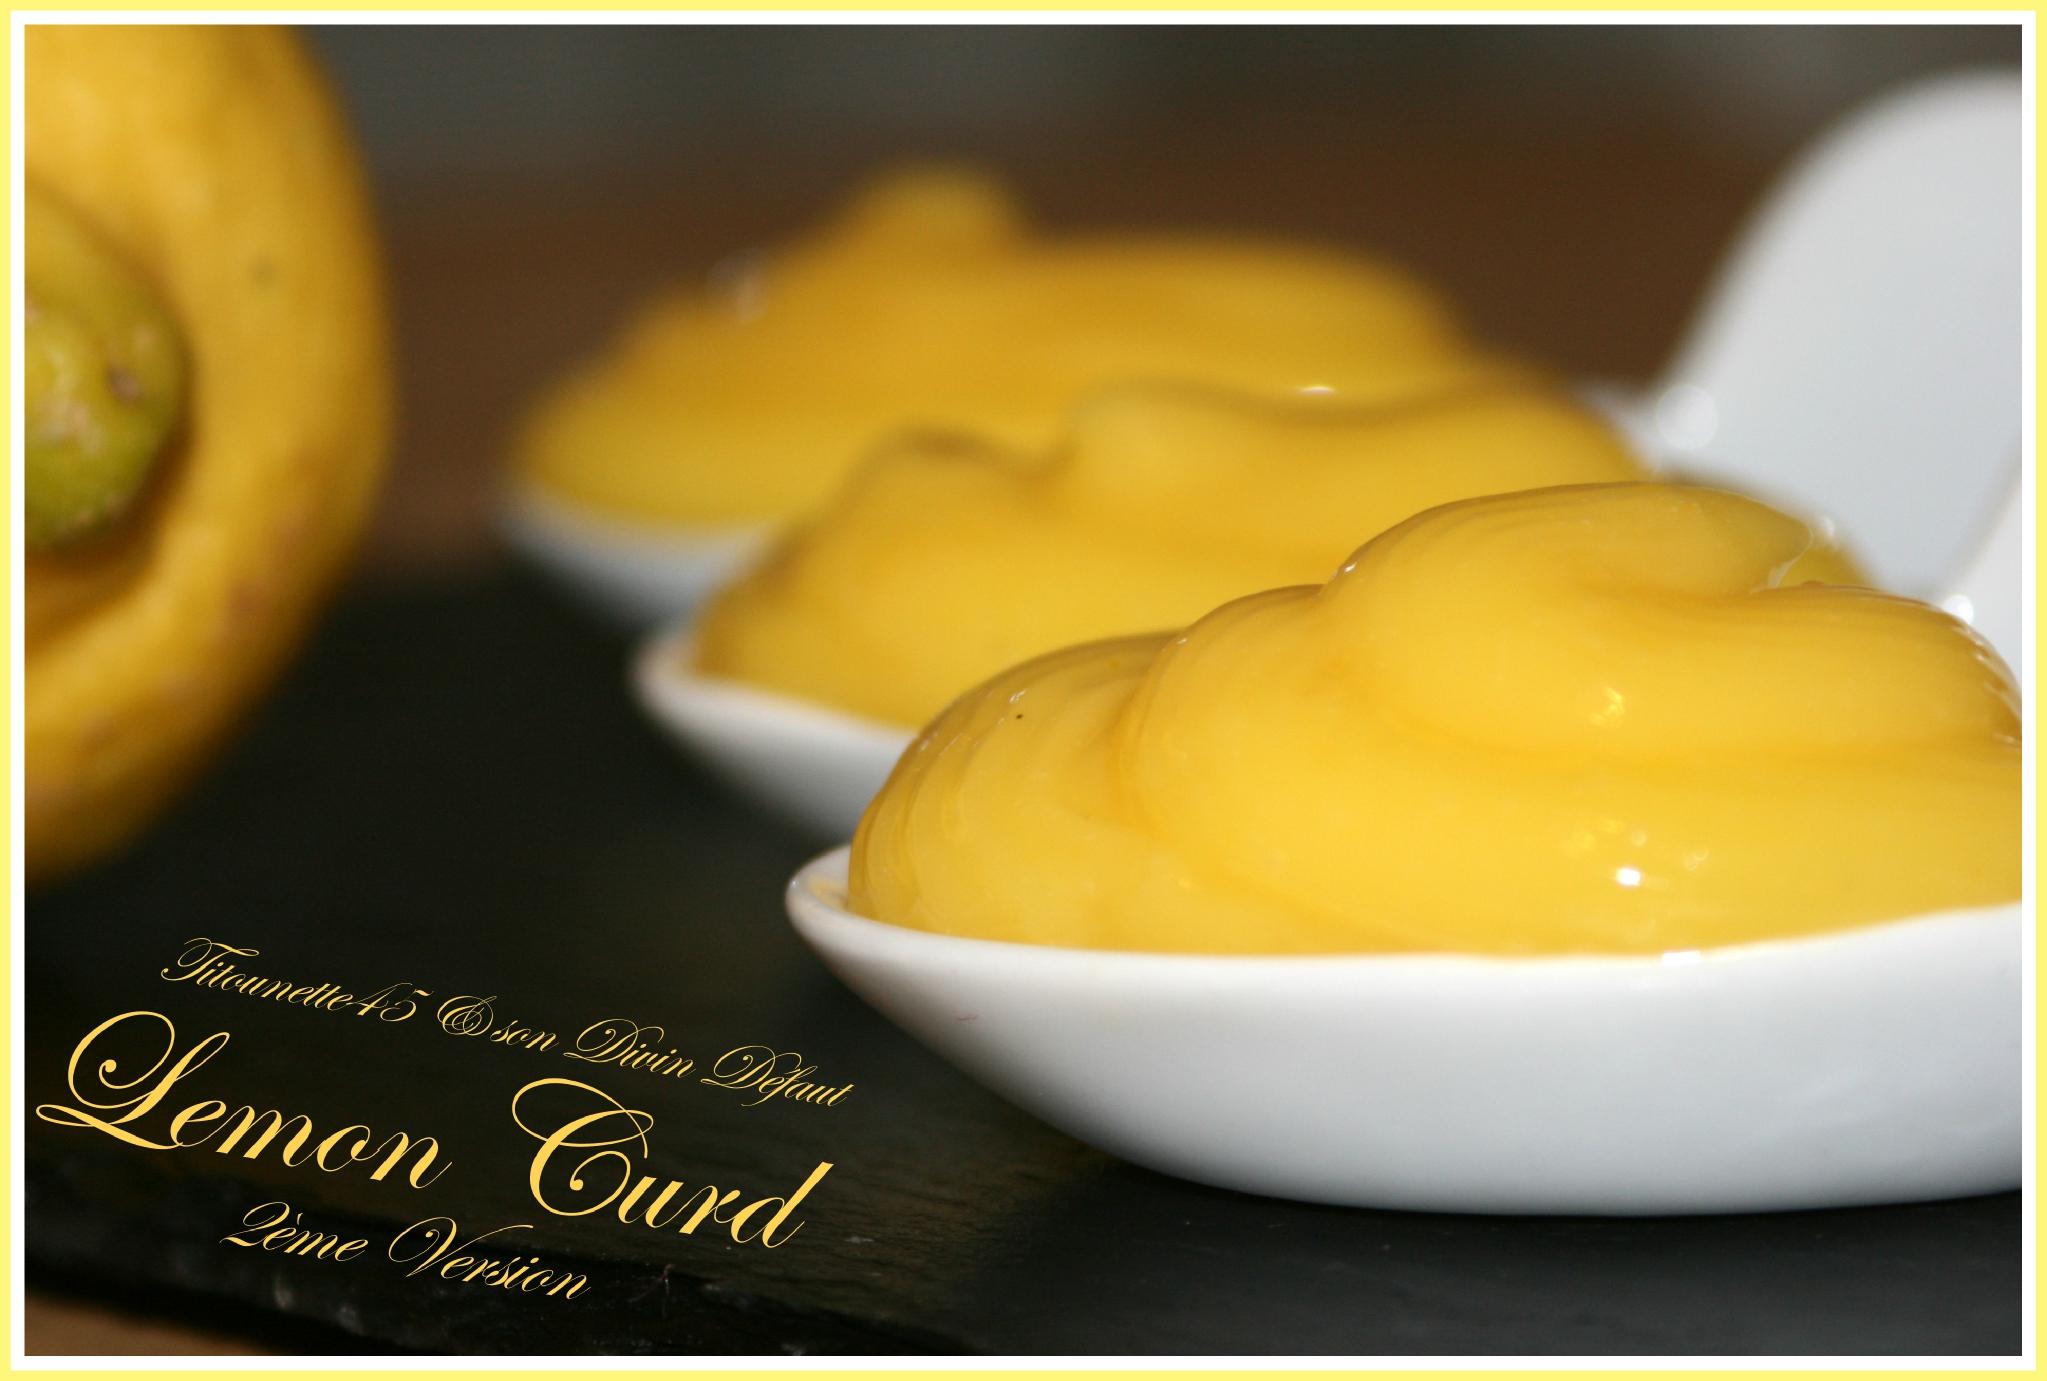 Lemon curd 2eme version